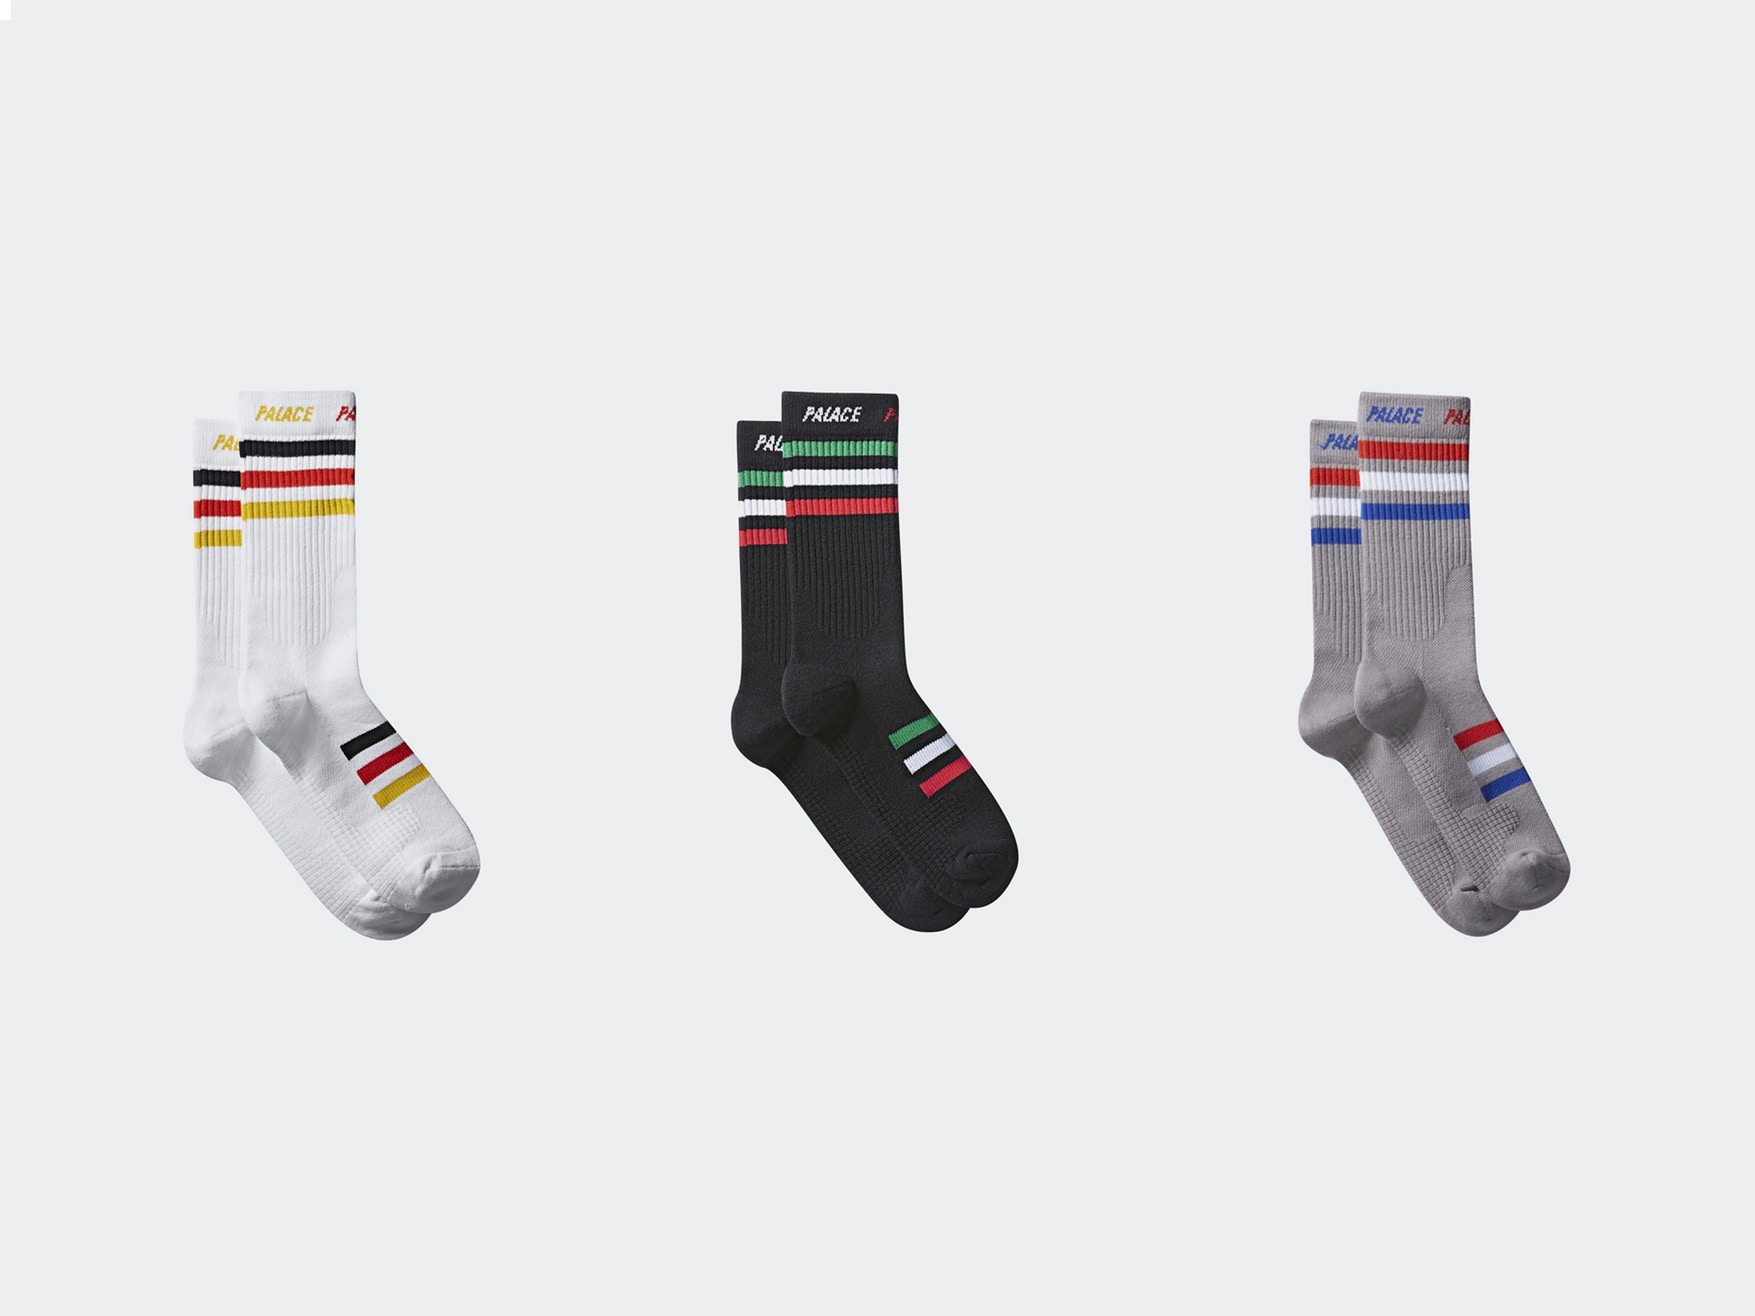 palace-adidas-originals-summer-2018-collection-0010.jpg